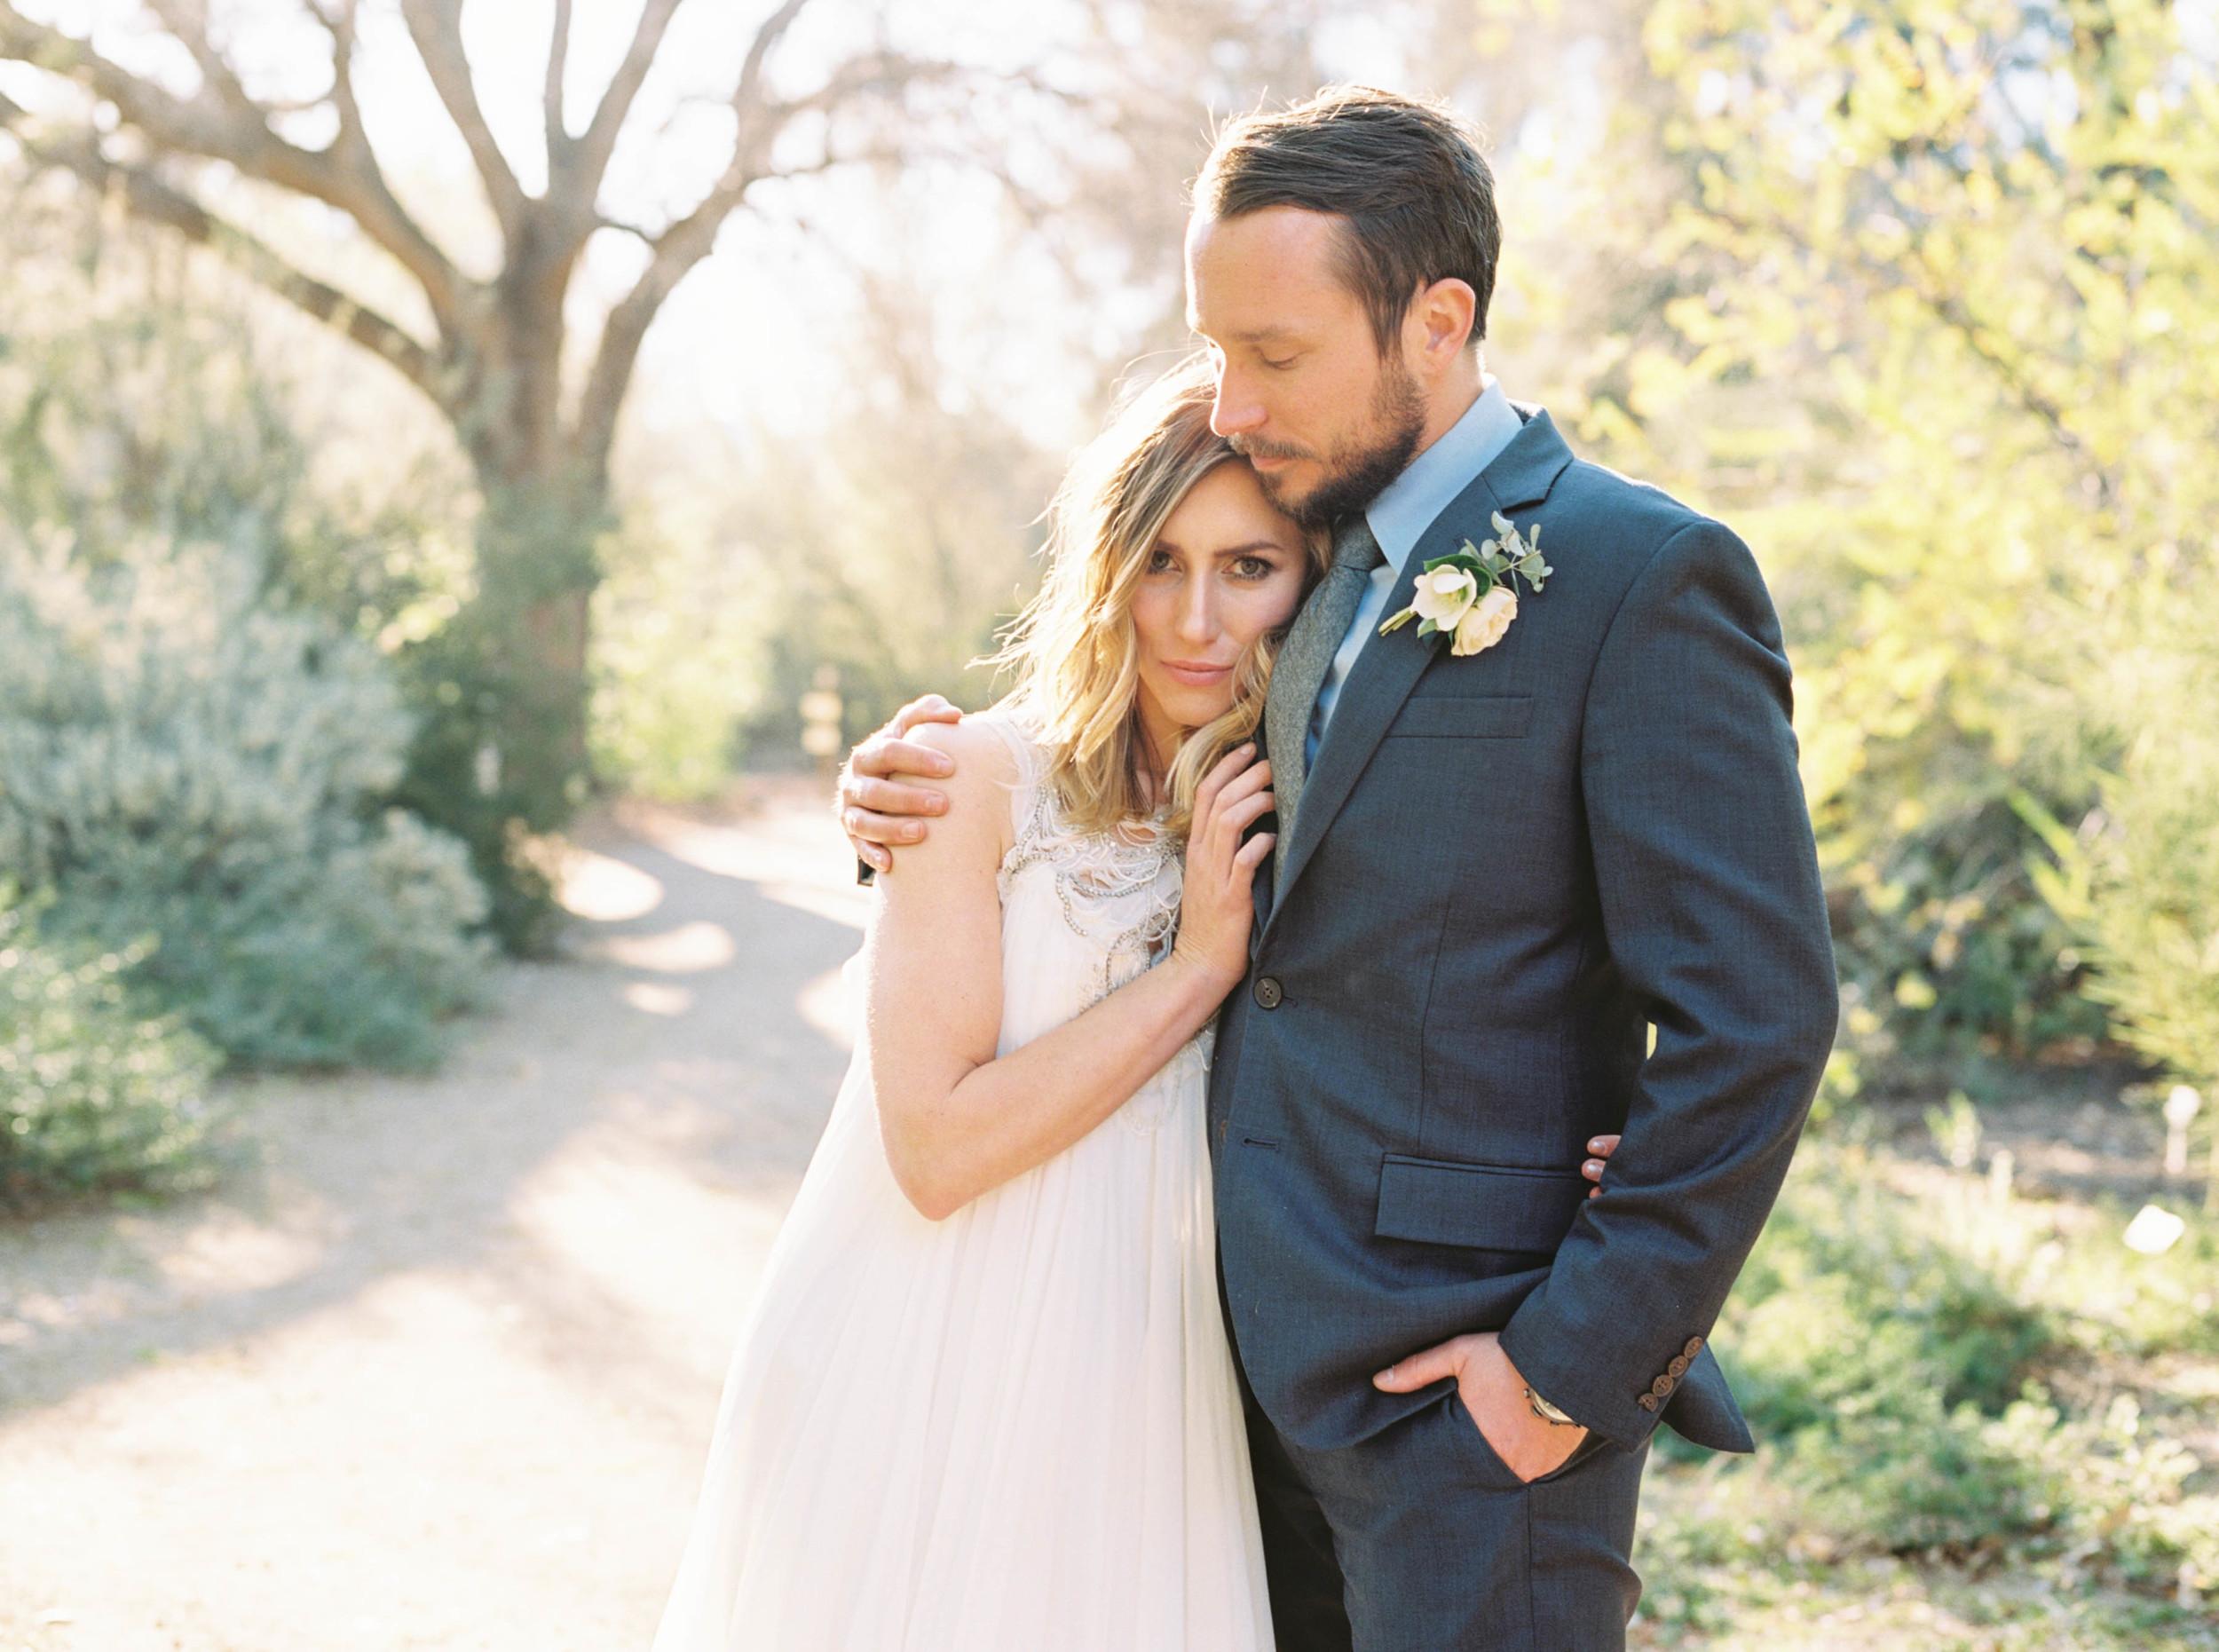 Danford-Photography-Bozeman-Big Sky-Glacier-Fine Art Film-Wedding-Engagement-Photographers-16.jpg